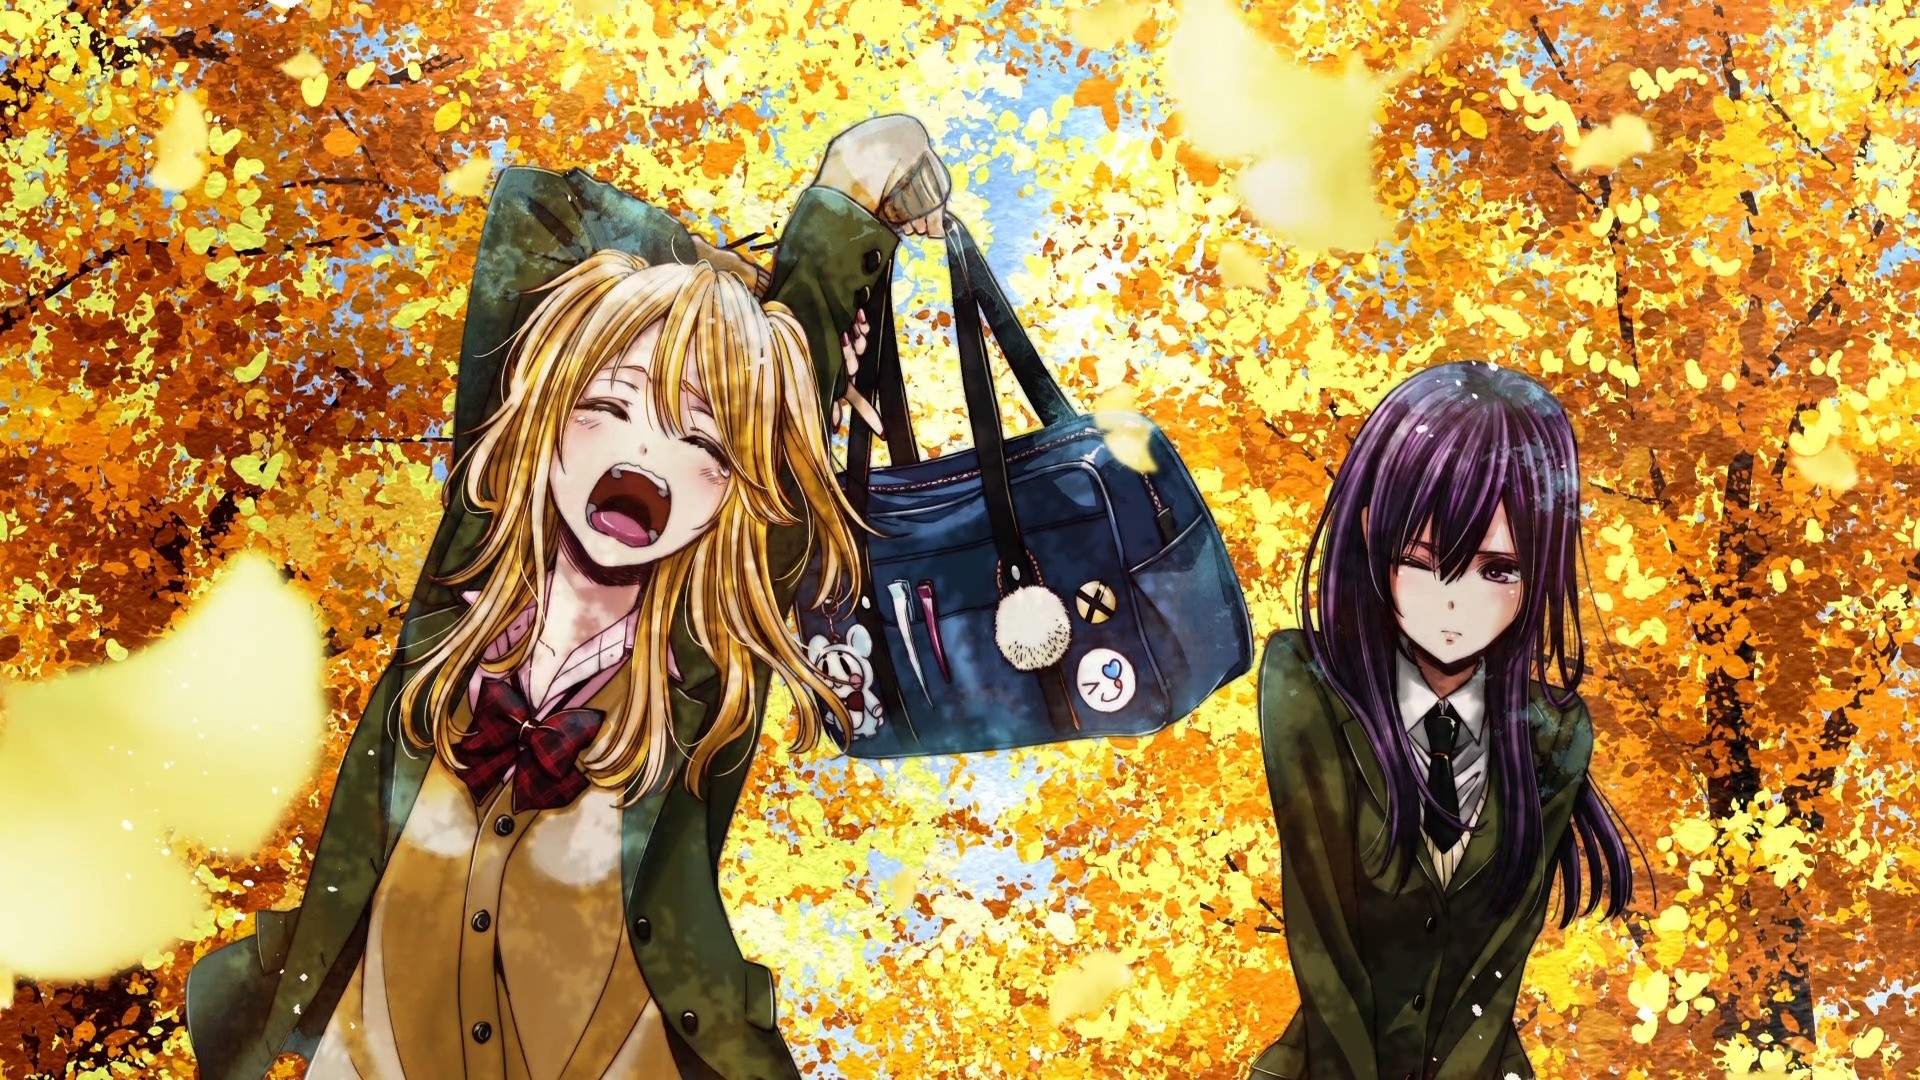 Citrus Anime HD Desktop Wallpaper